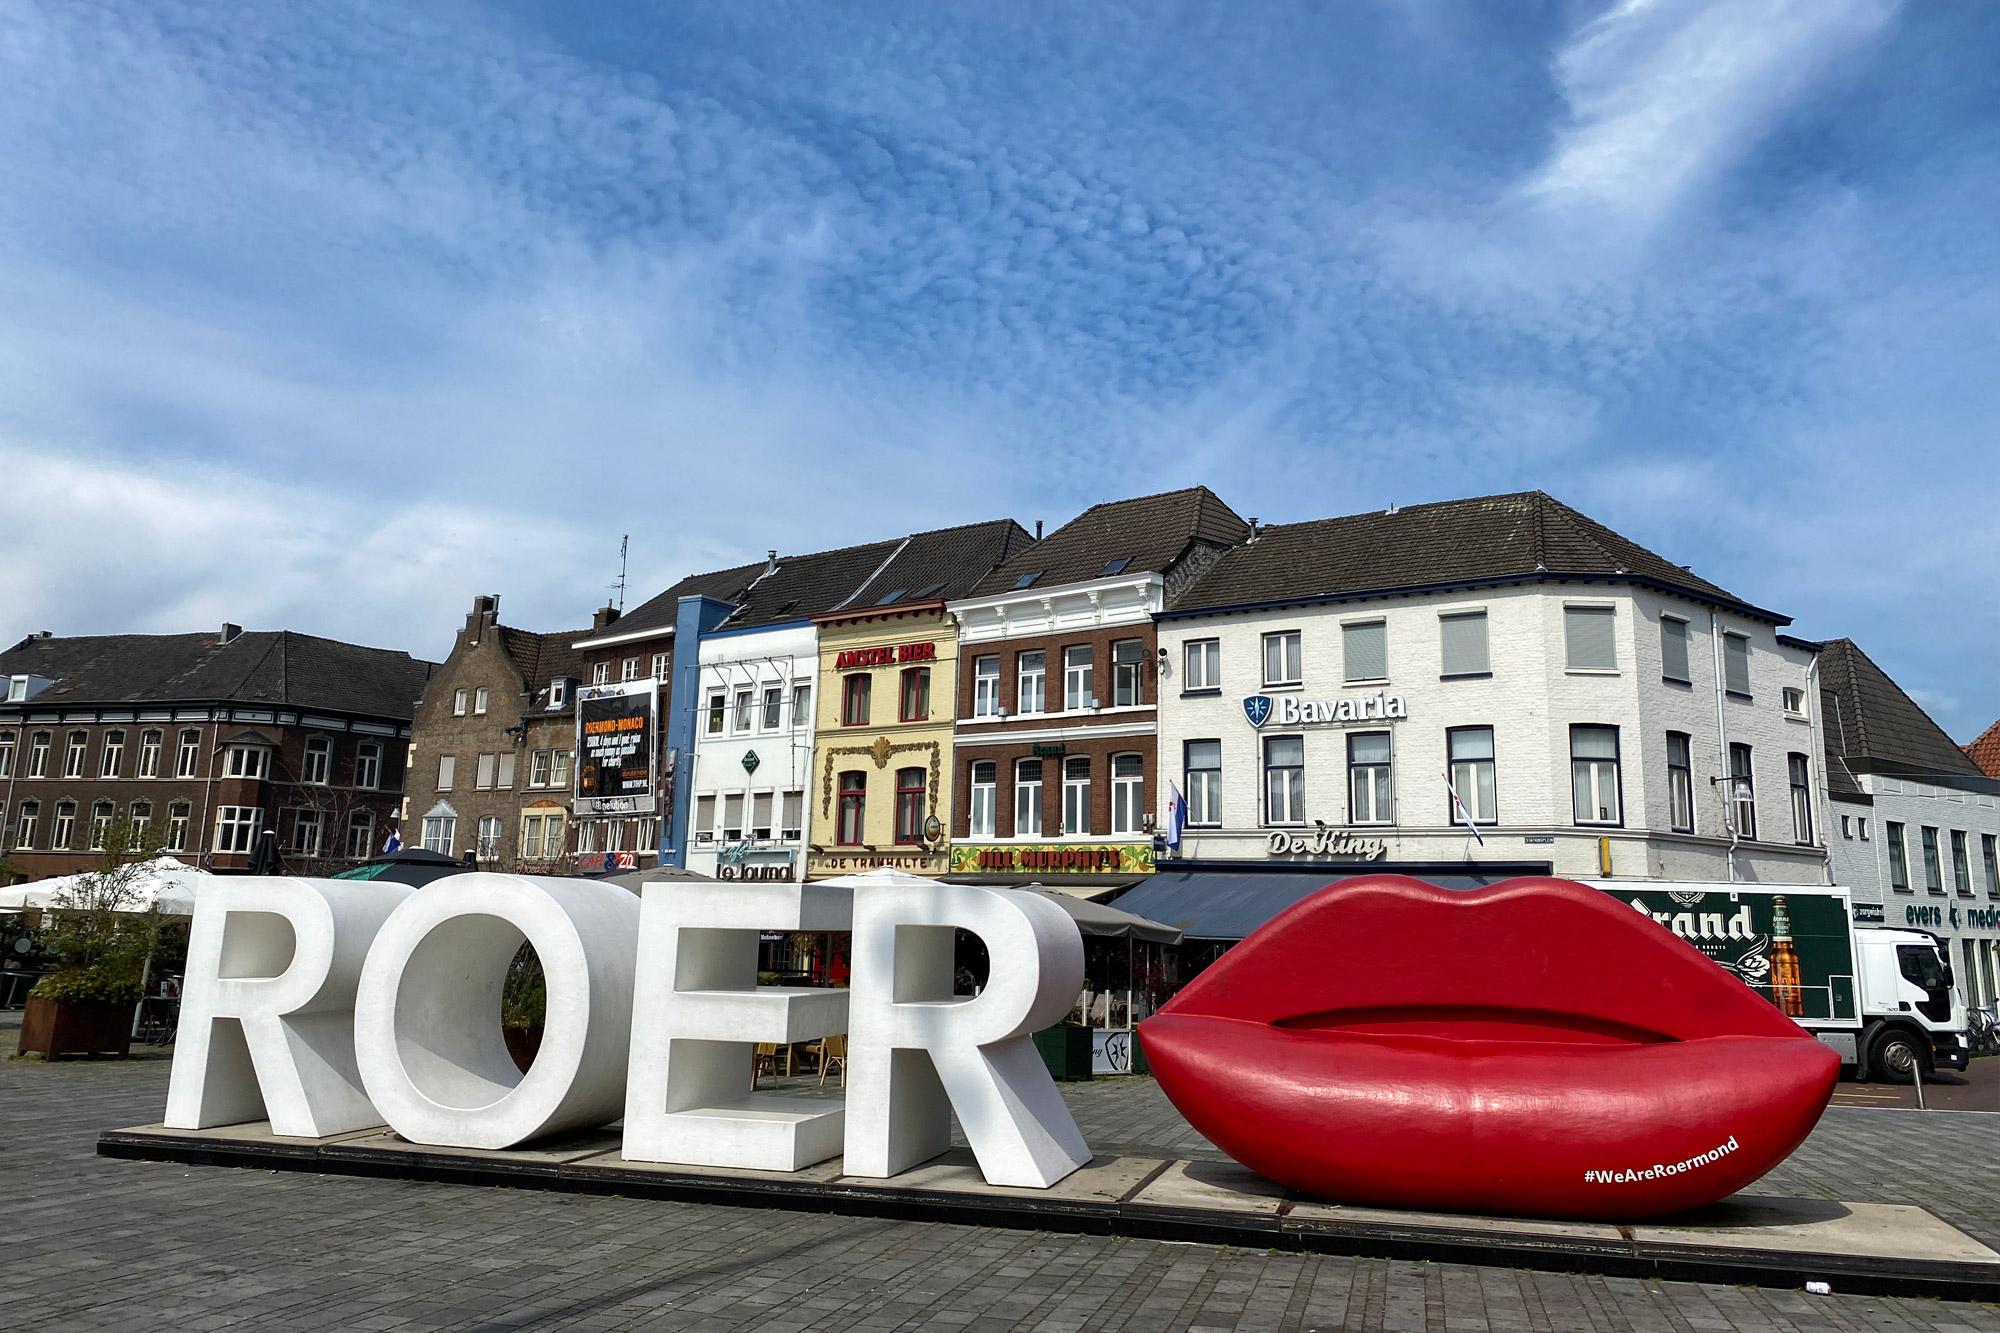 Roermond - Kunstwerk Roermond